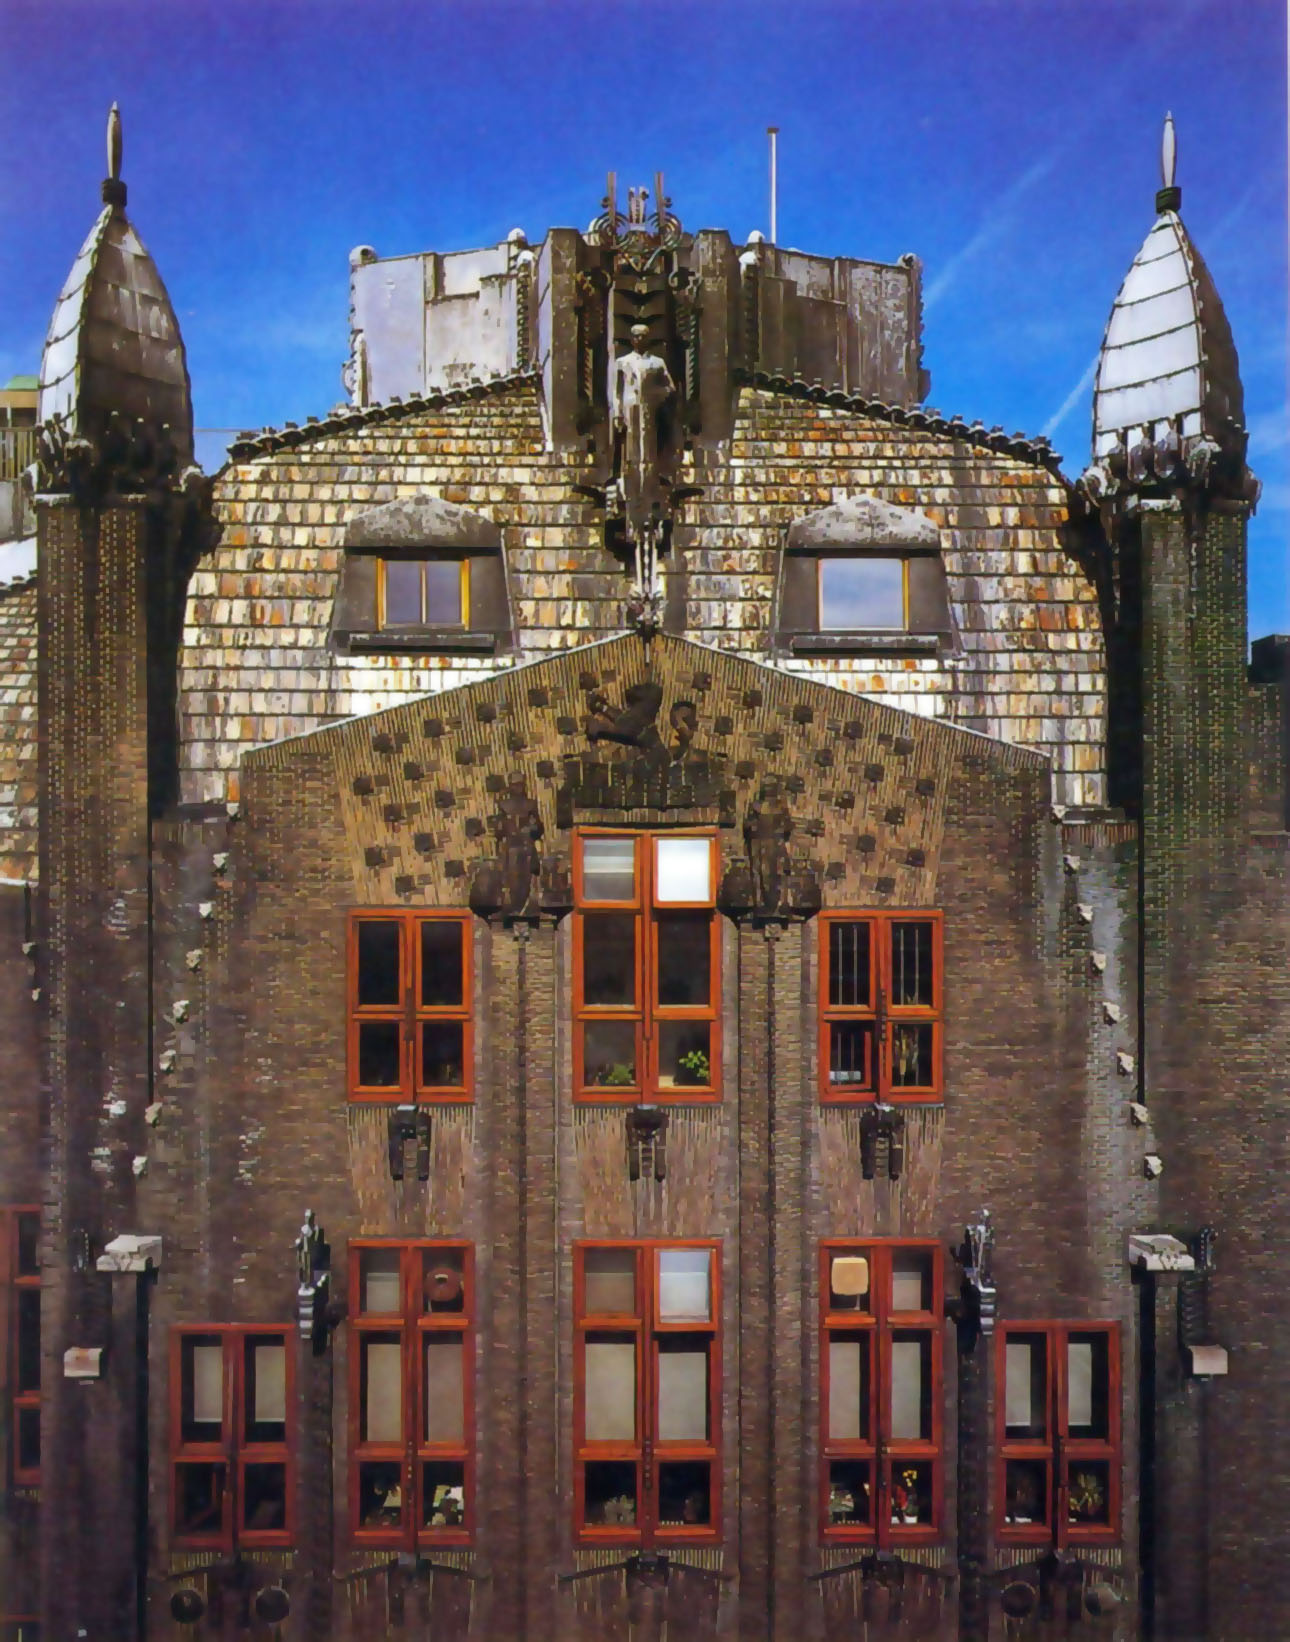 Casa da Navegação - Johan Van der Mey, Piet Kramer, Michel de Klerk